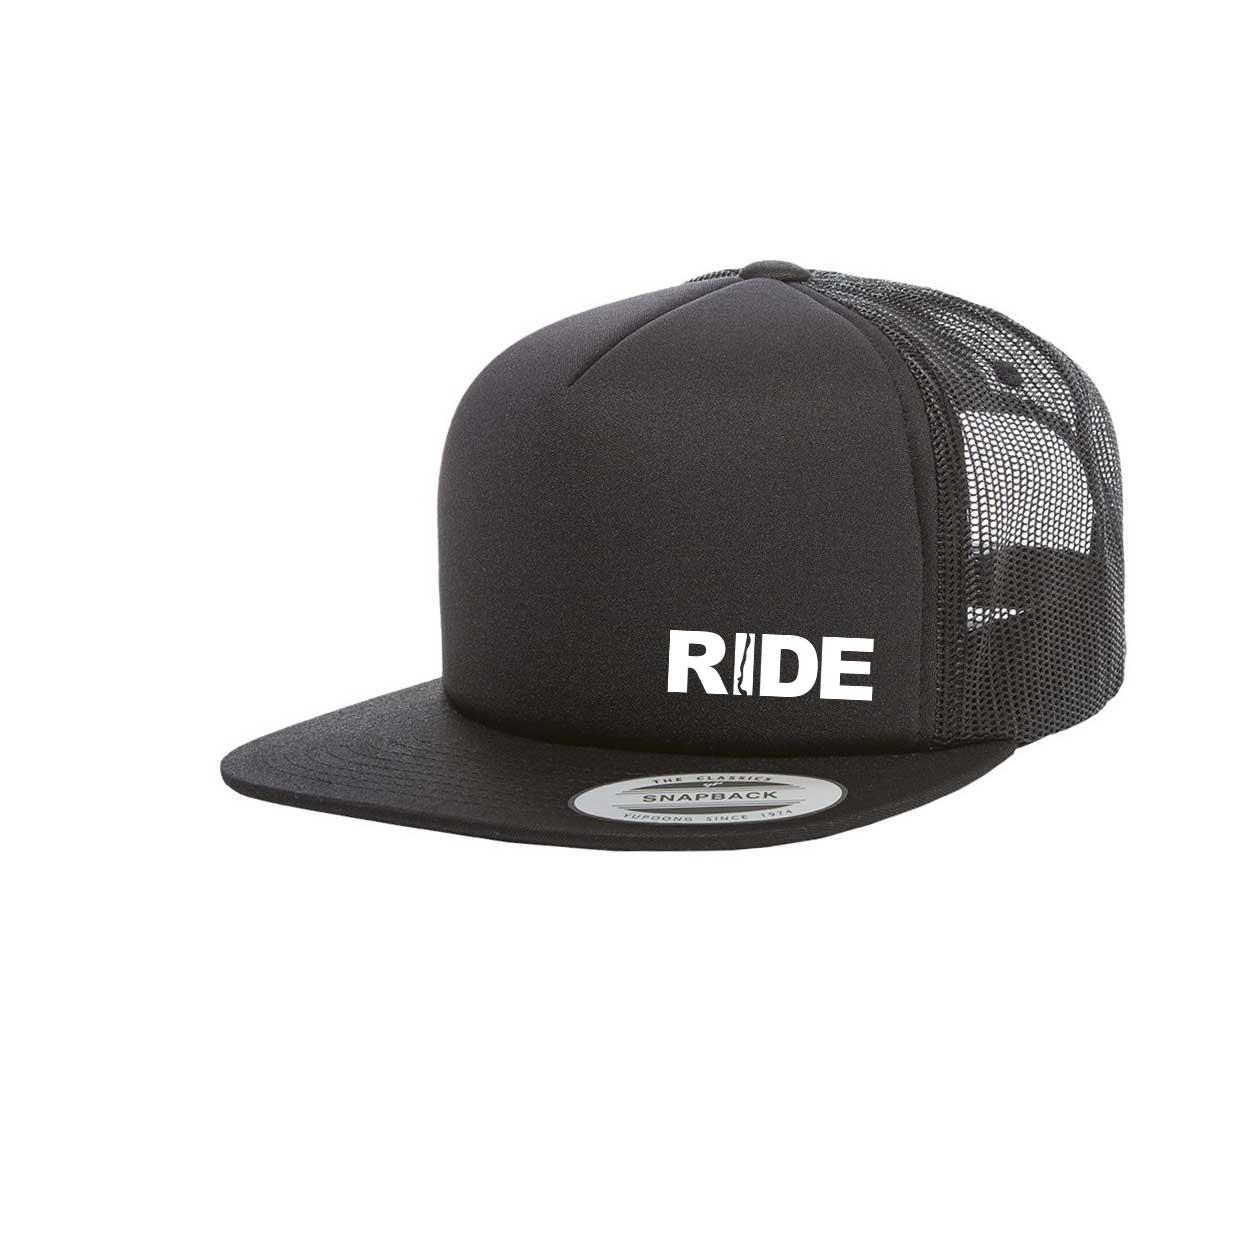 Ride Chile Night Out Premium Foam Flat Brim Snapback Hat Black (White Logo)